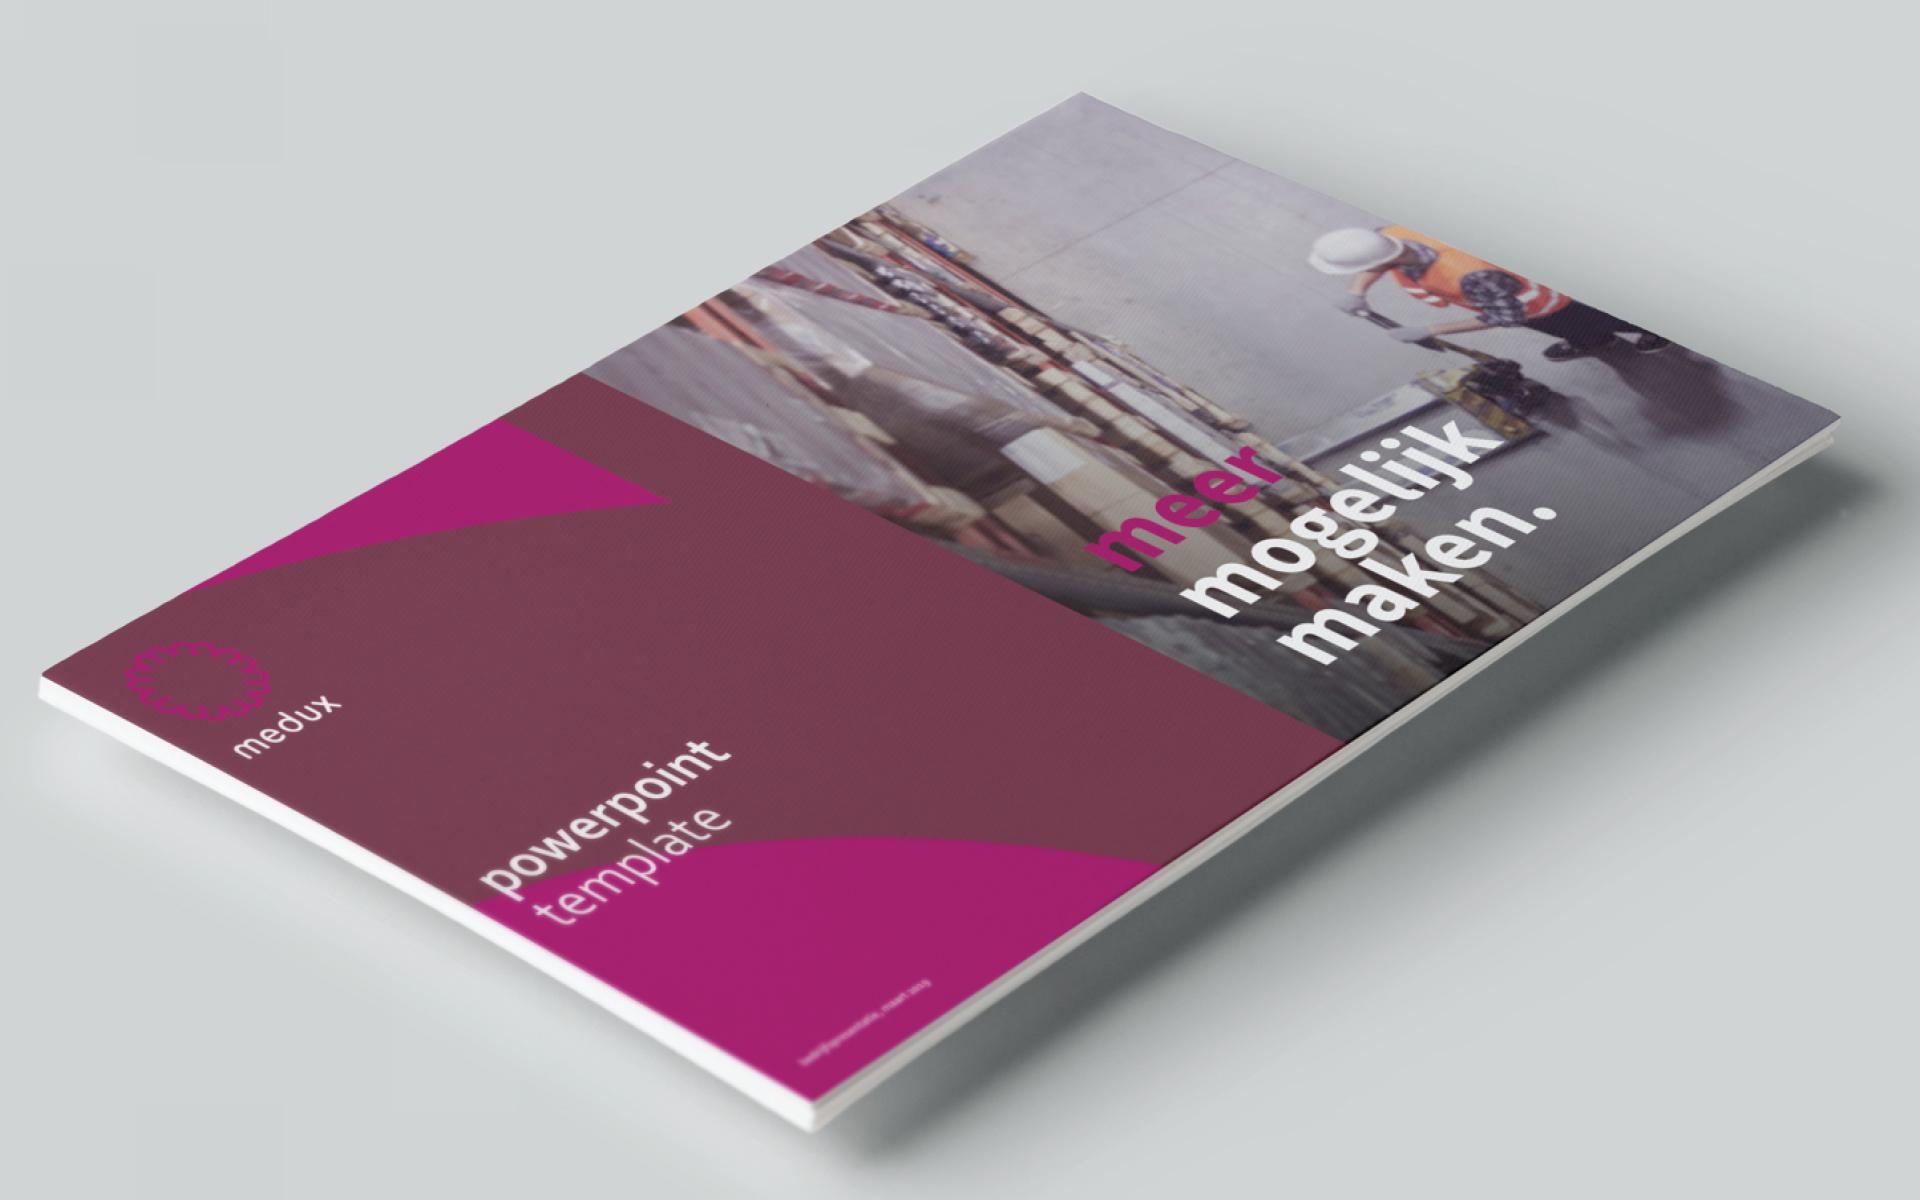 Medux cover brand book DAY Creative Strategic Consultancy / Brand Design